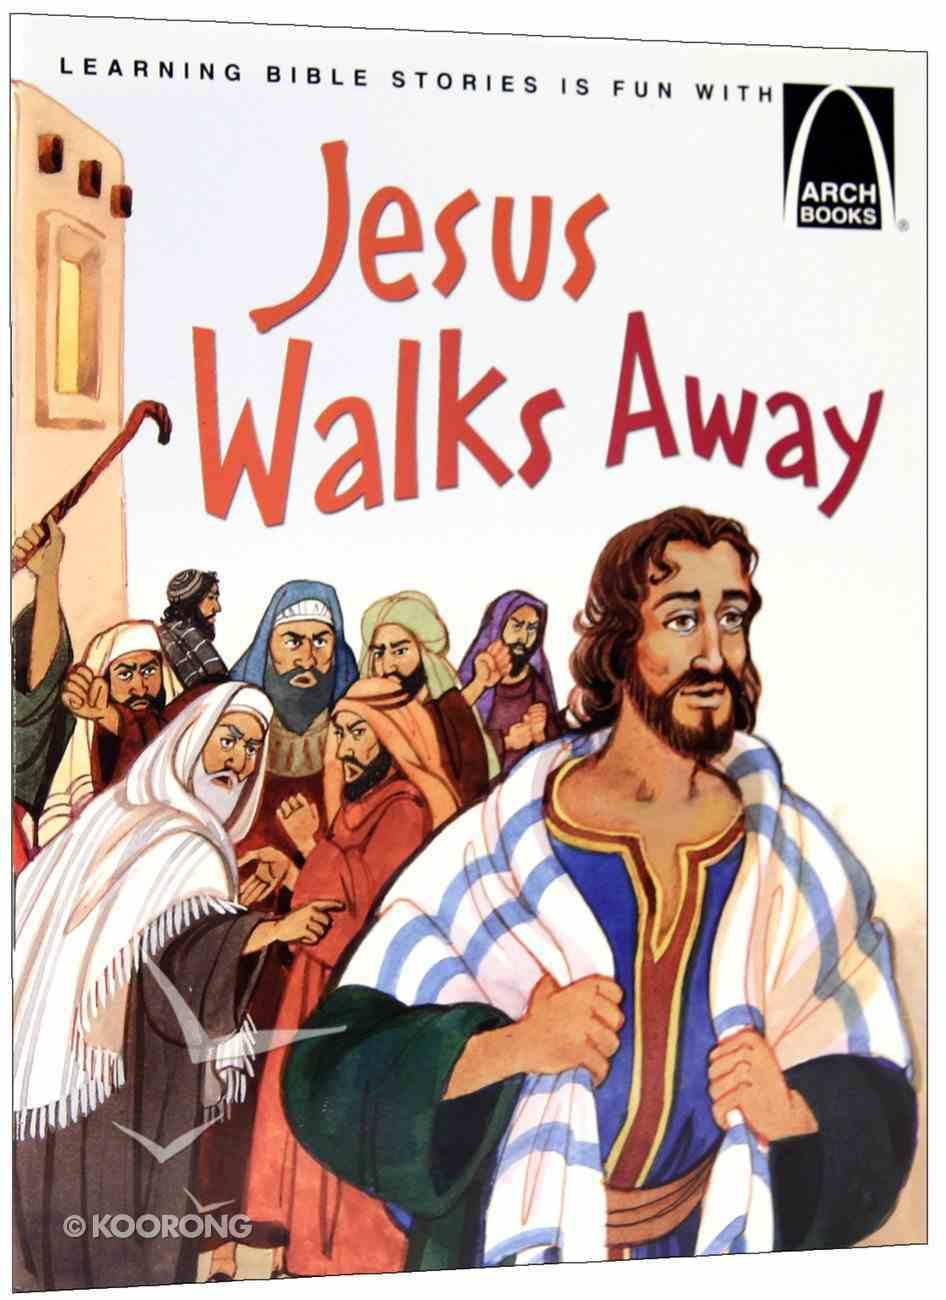 Jesus Walks Away (Arch Books Series) Paperback